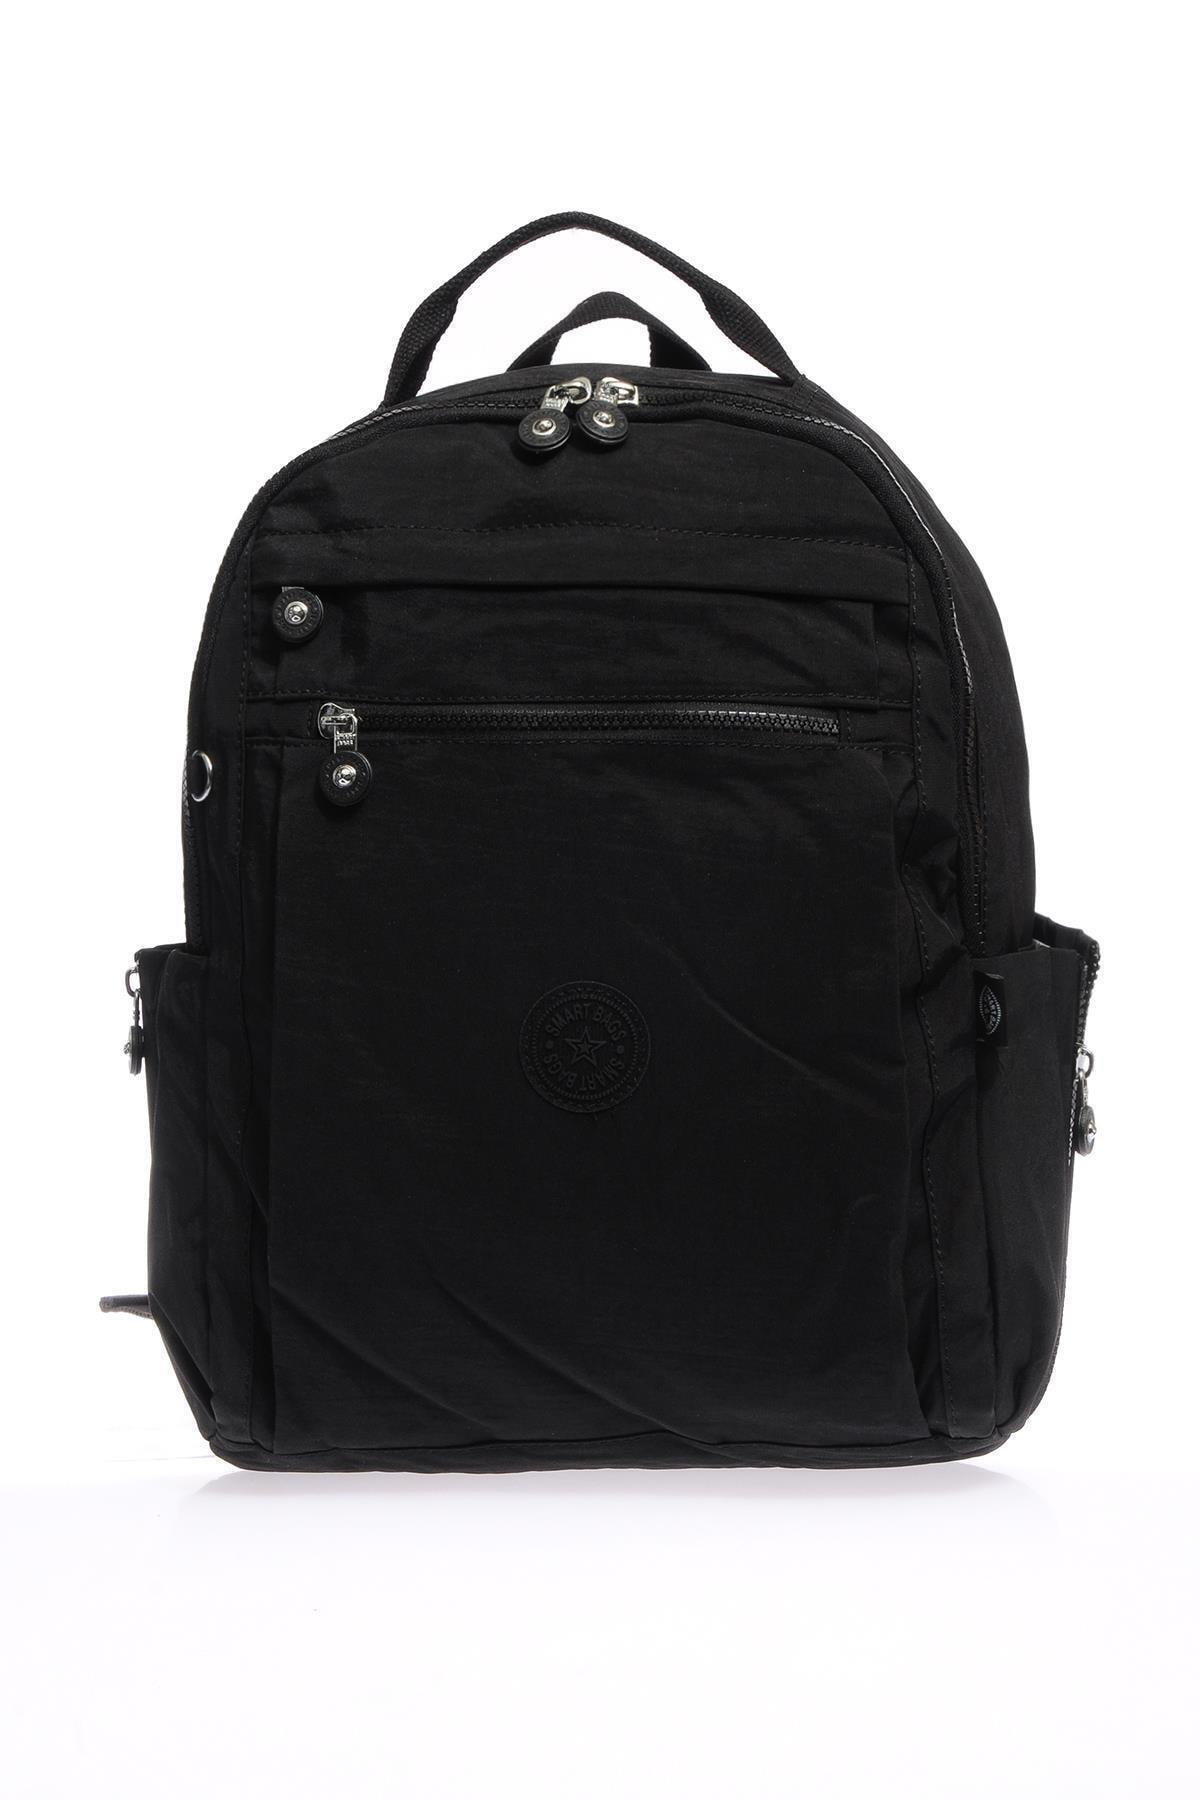 SMART BAGS Smb1247-0001 Siyah Kadın Sırt Çantası 1